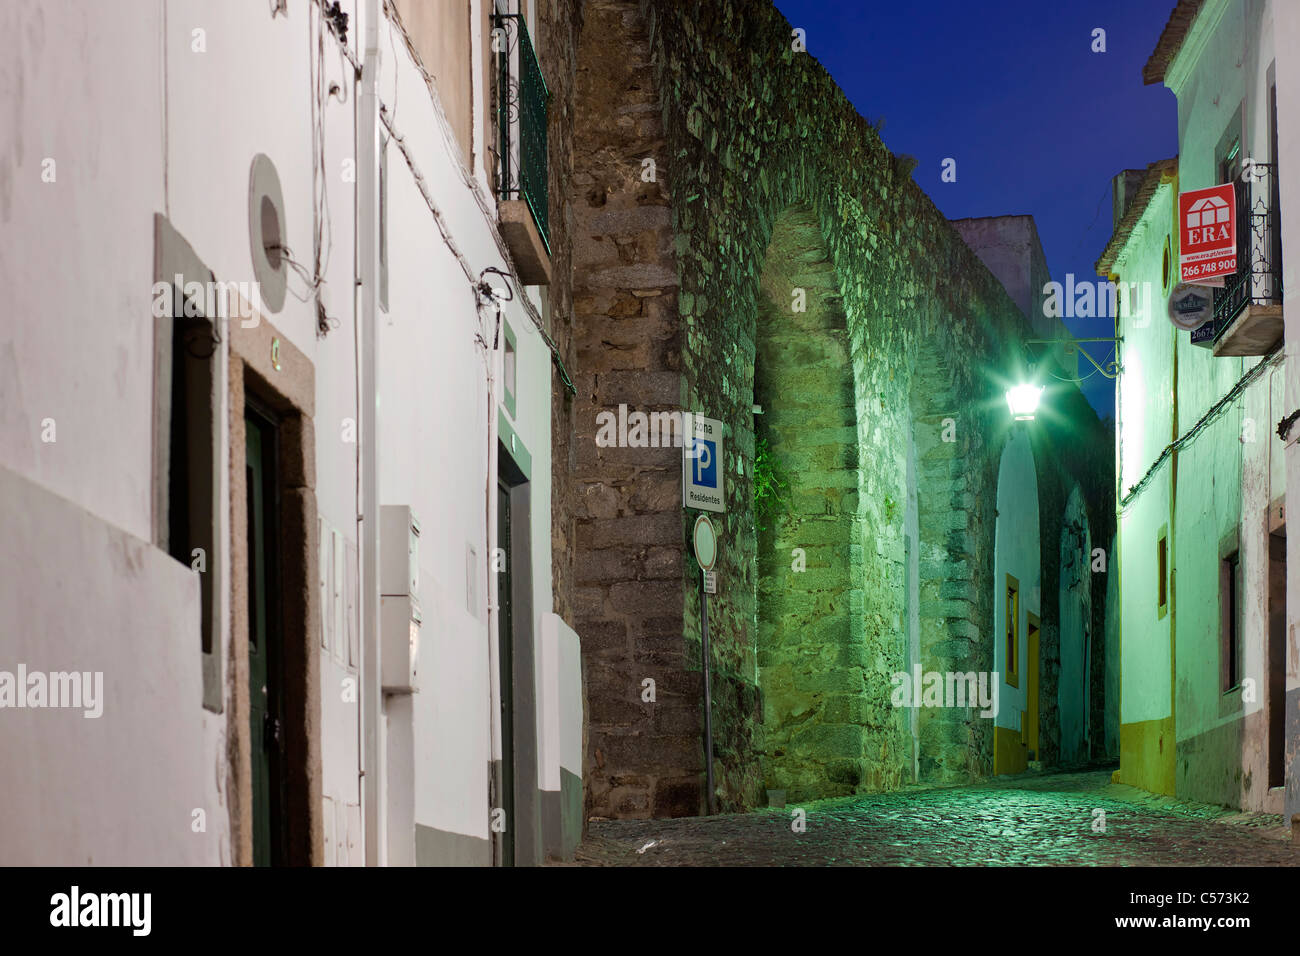 Cano Street, Evora, Portugal, Europe - Stock Image